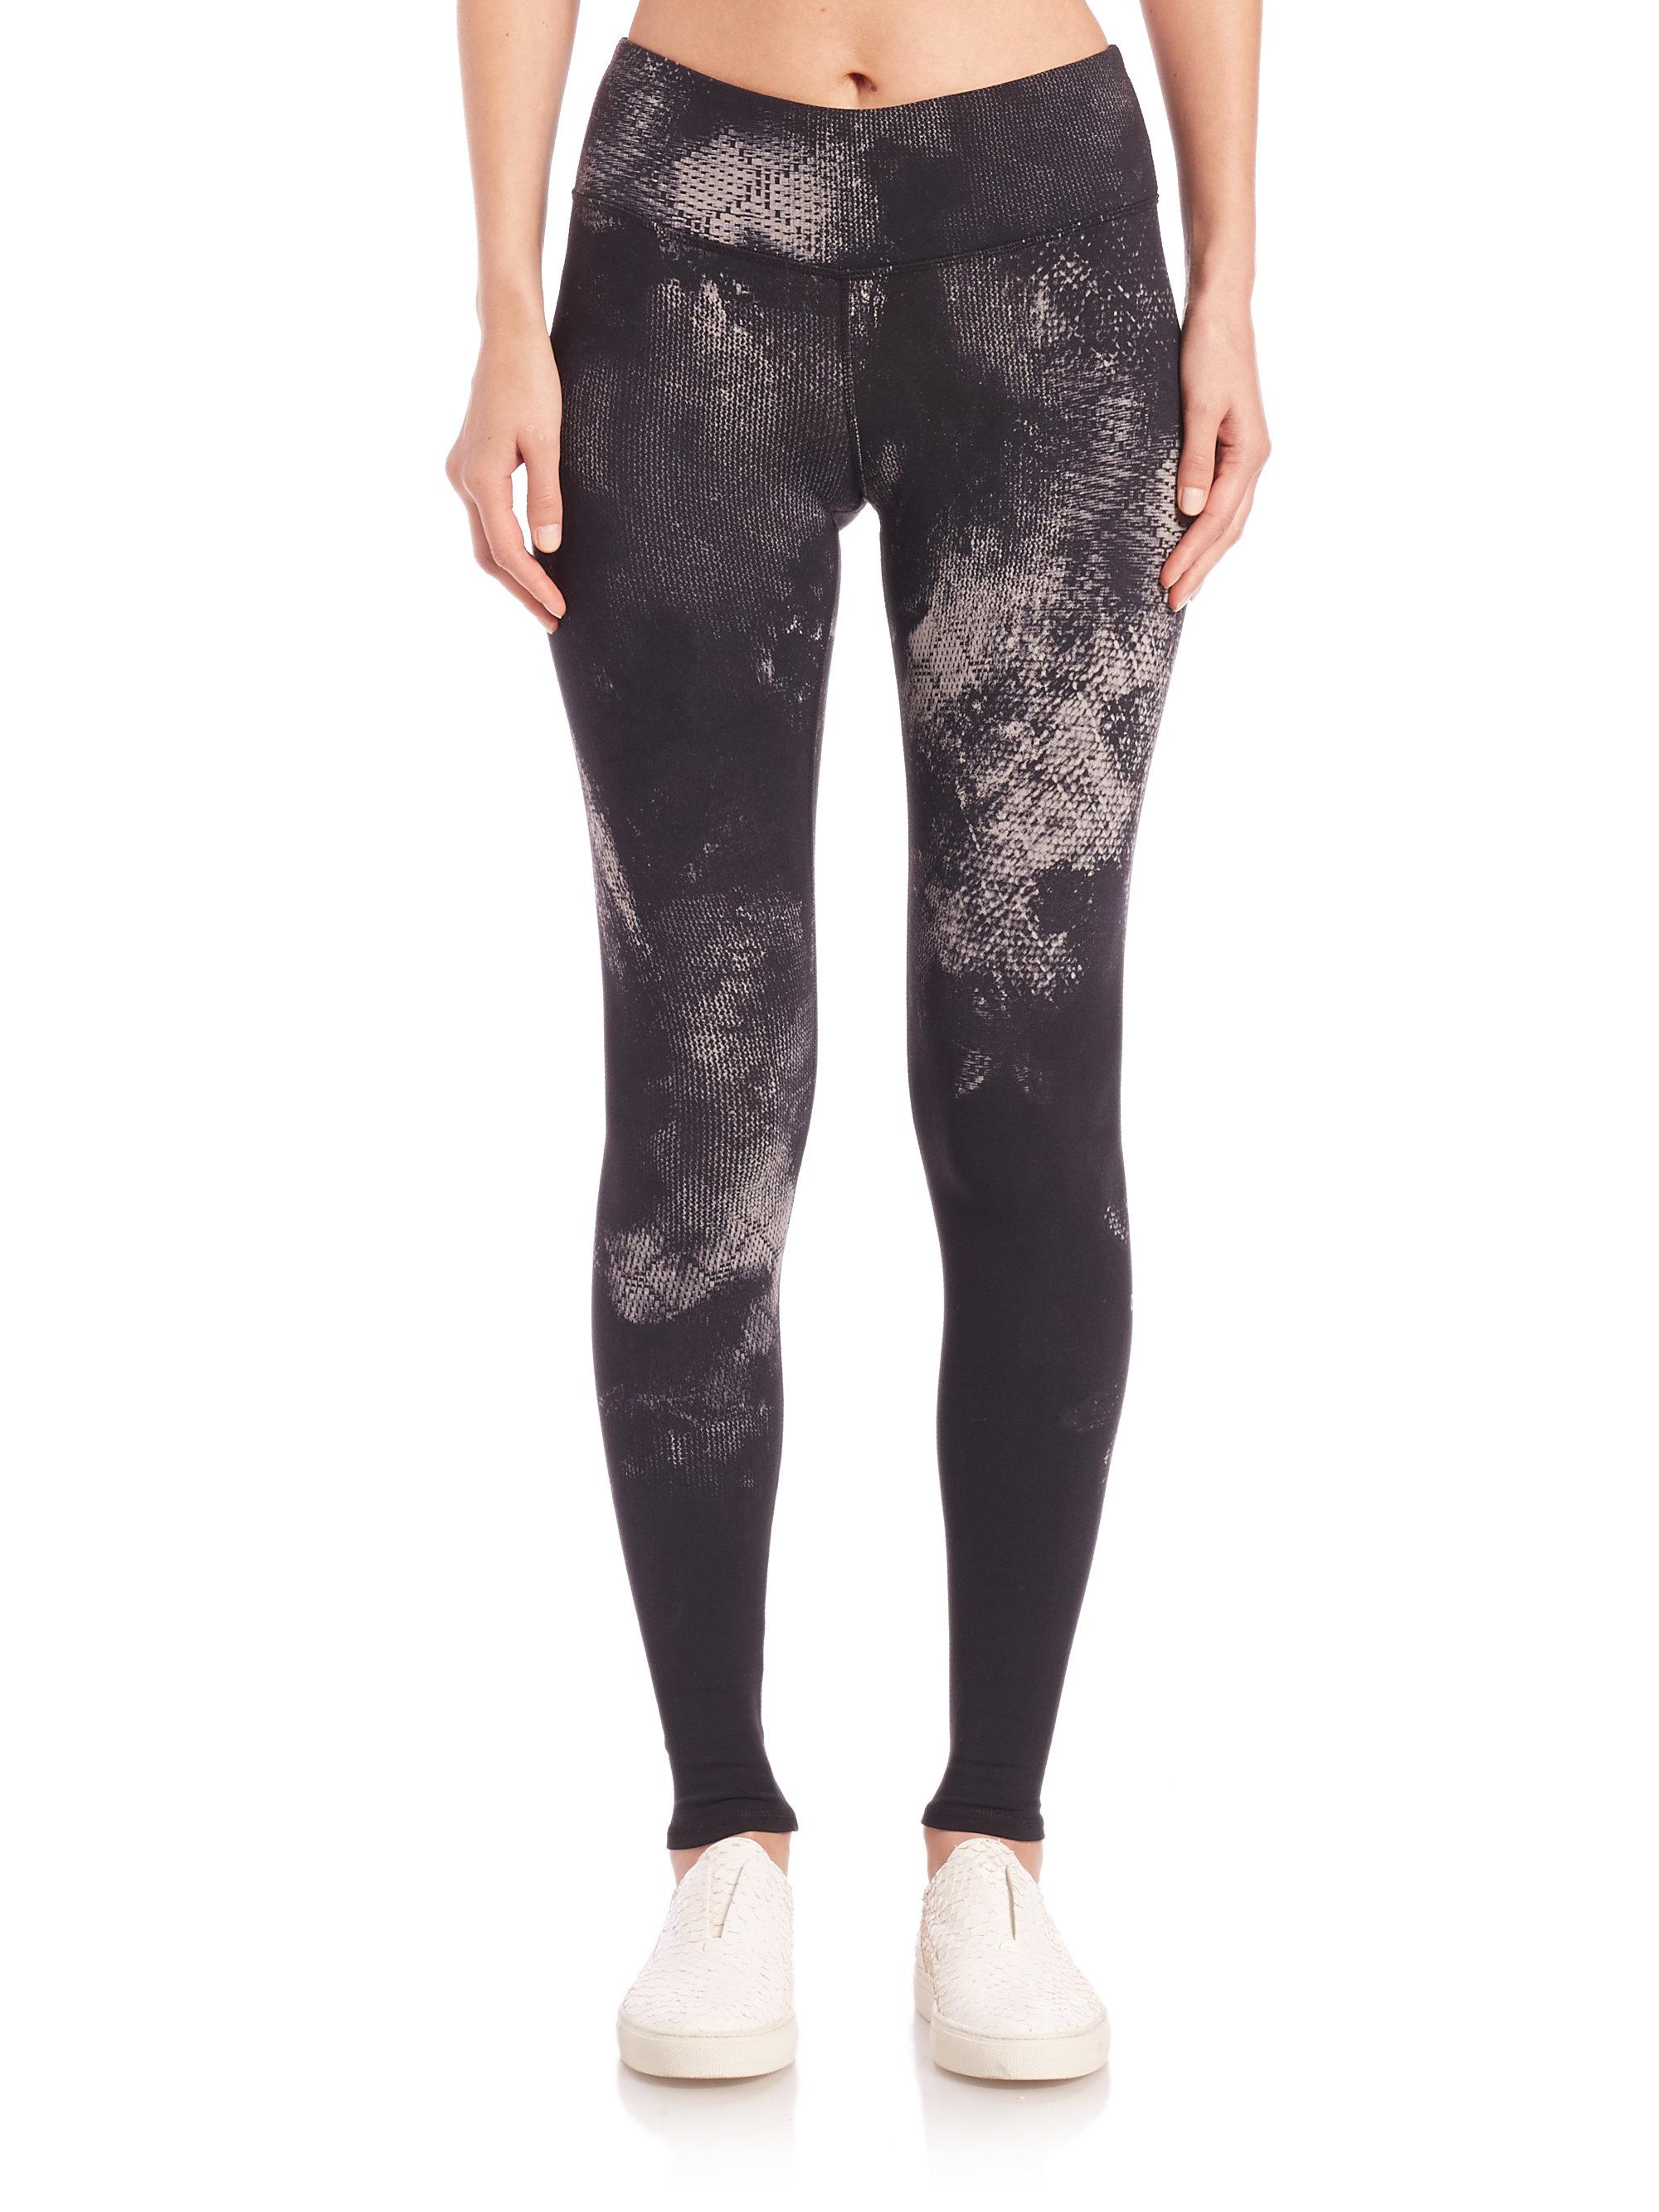 35b7f1c395 Alo Yoga Airbrush-print Leggings in Black - Lyst